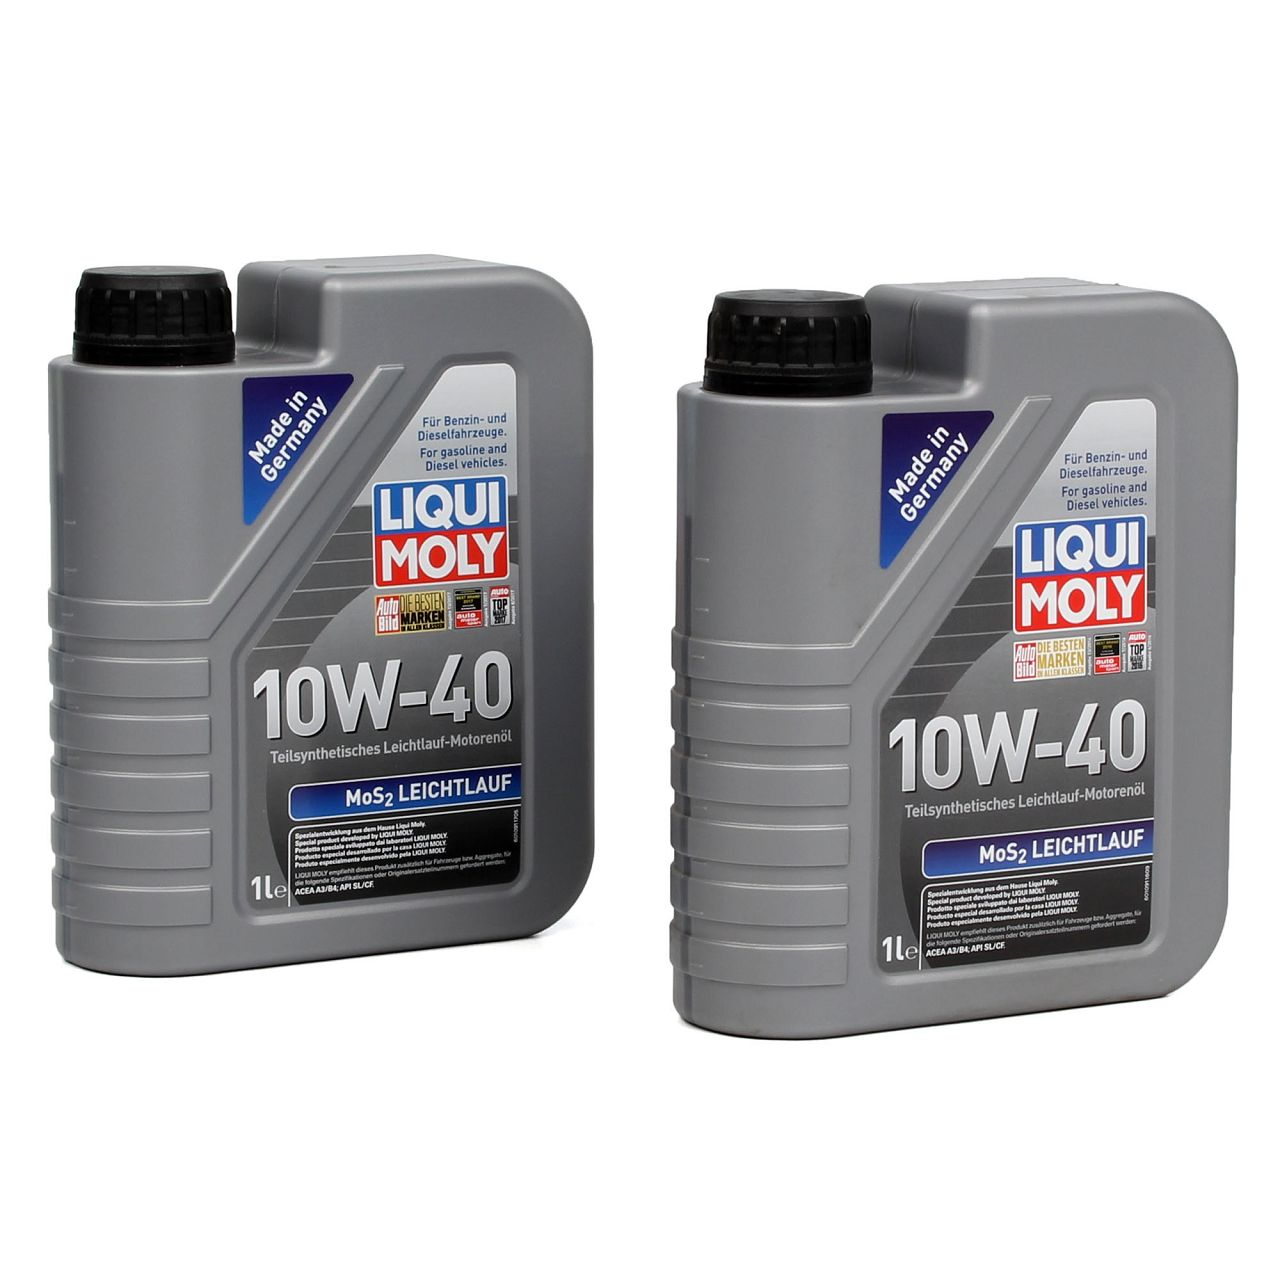 LIQUI MOLY Motoröl Öl MoS2 LEICHTLAUF 10W40 10W-40 2L 2Liter 1091